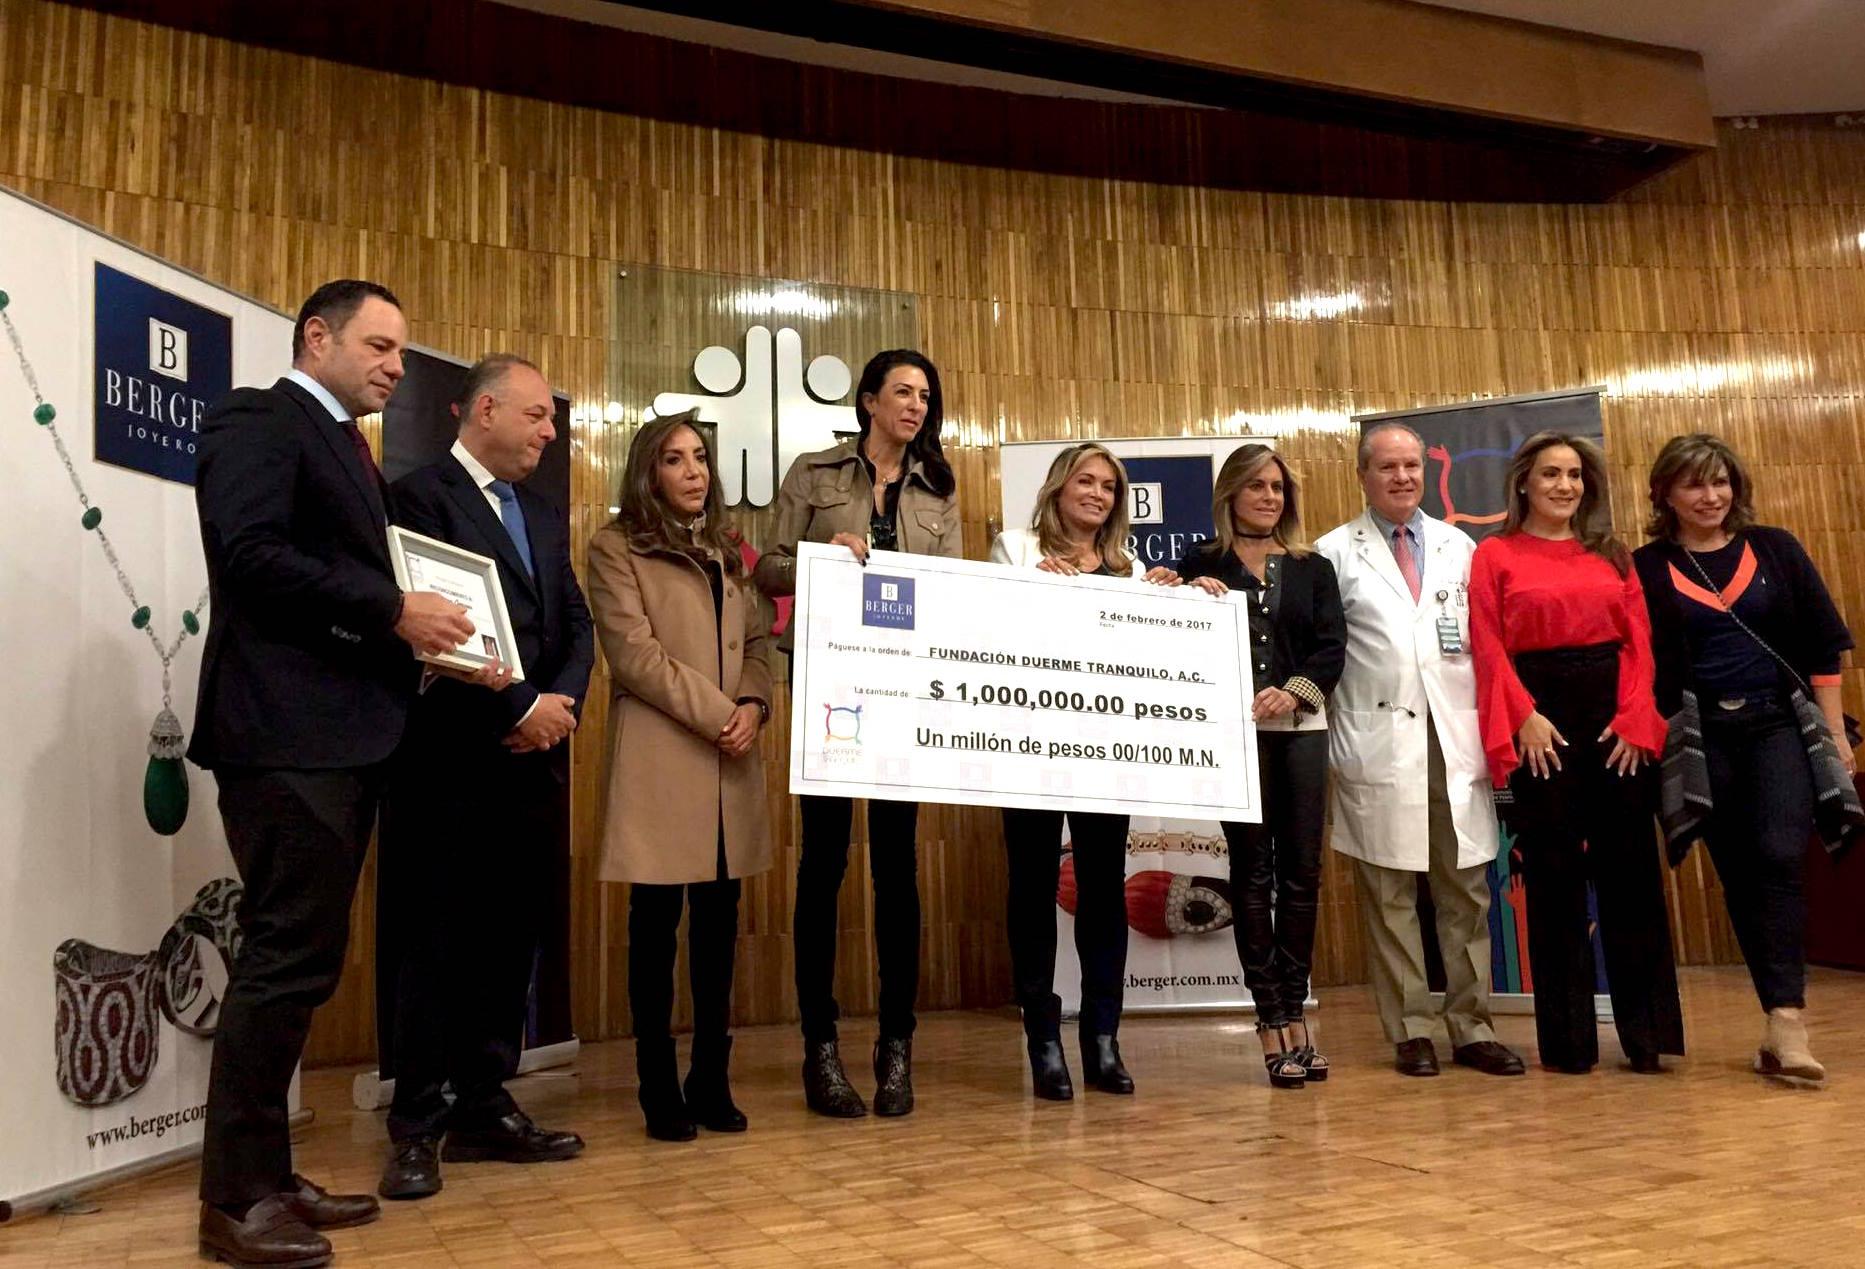 Berger anuncia cifra oficial a la Fundación Duerme Tranquilo, A.C.